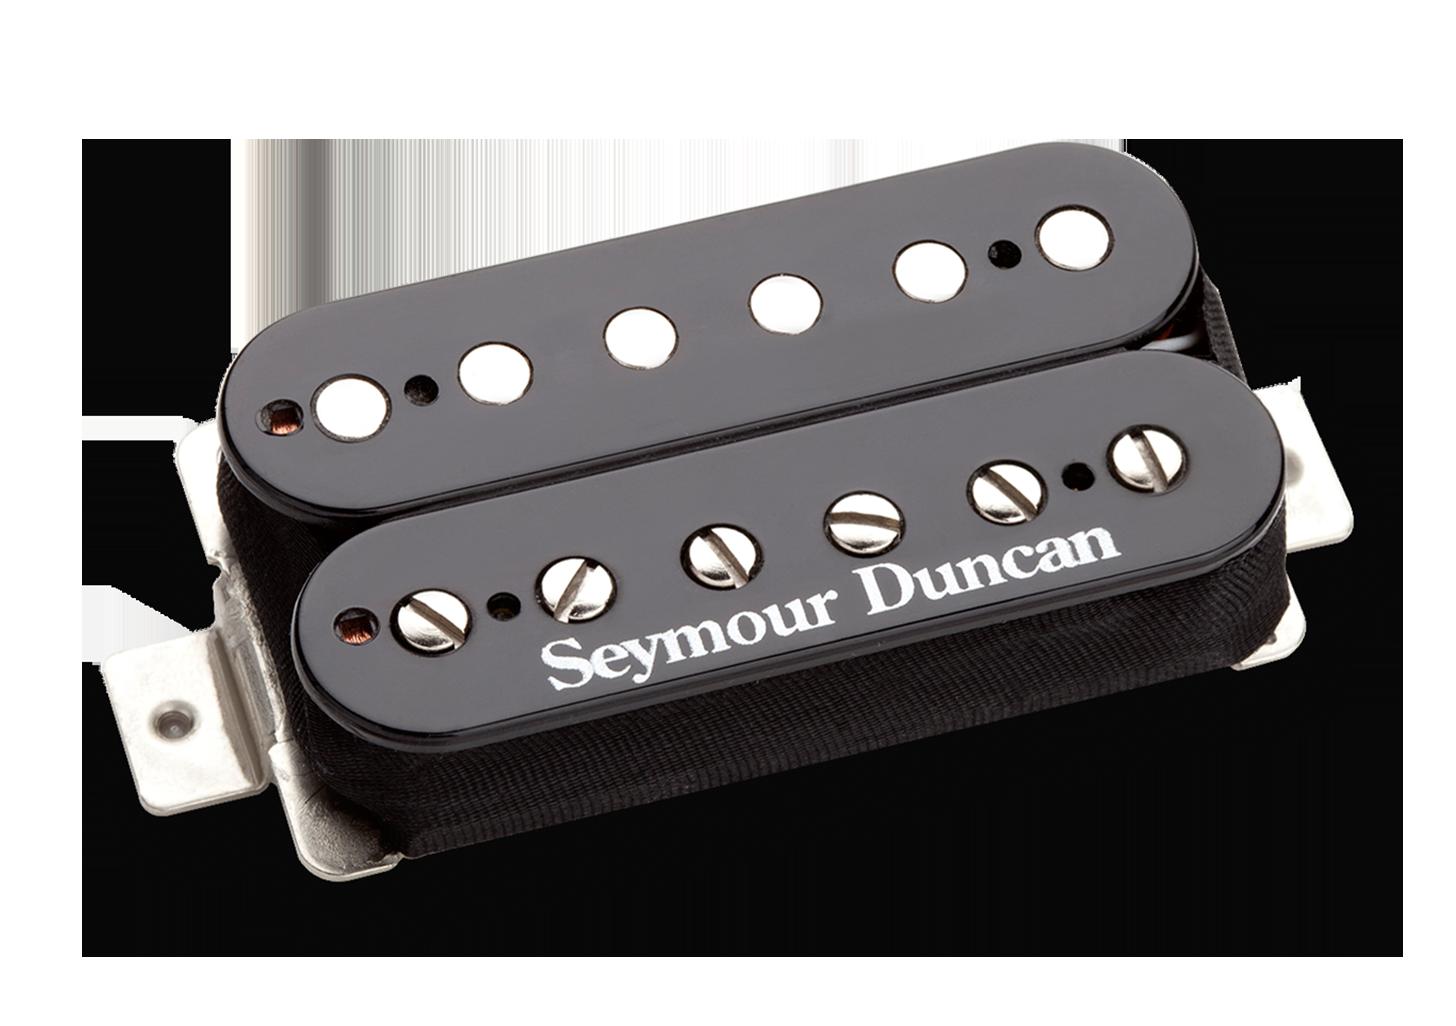 Seymour Duncan JB Humbucker (SH-4)